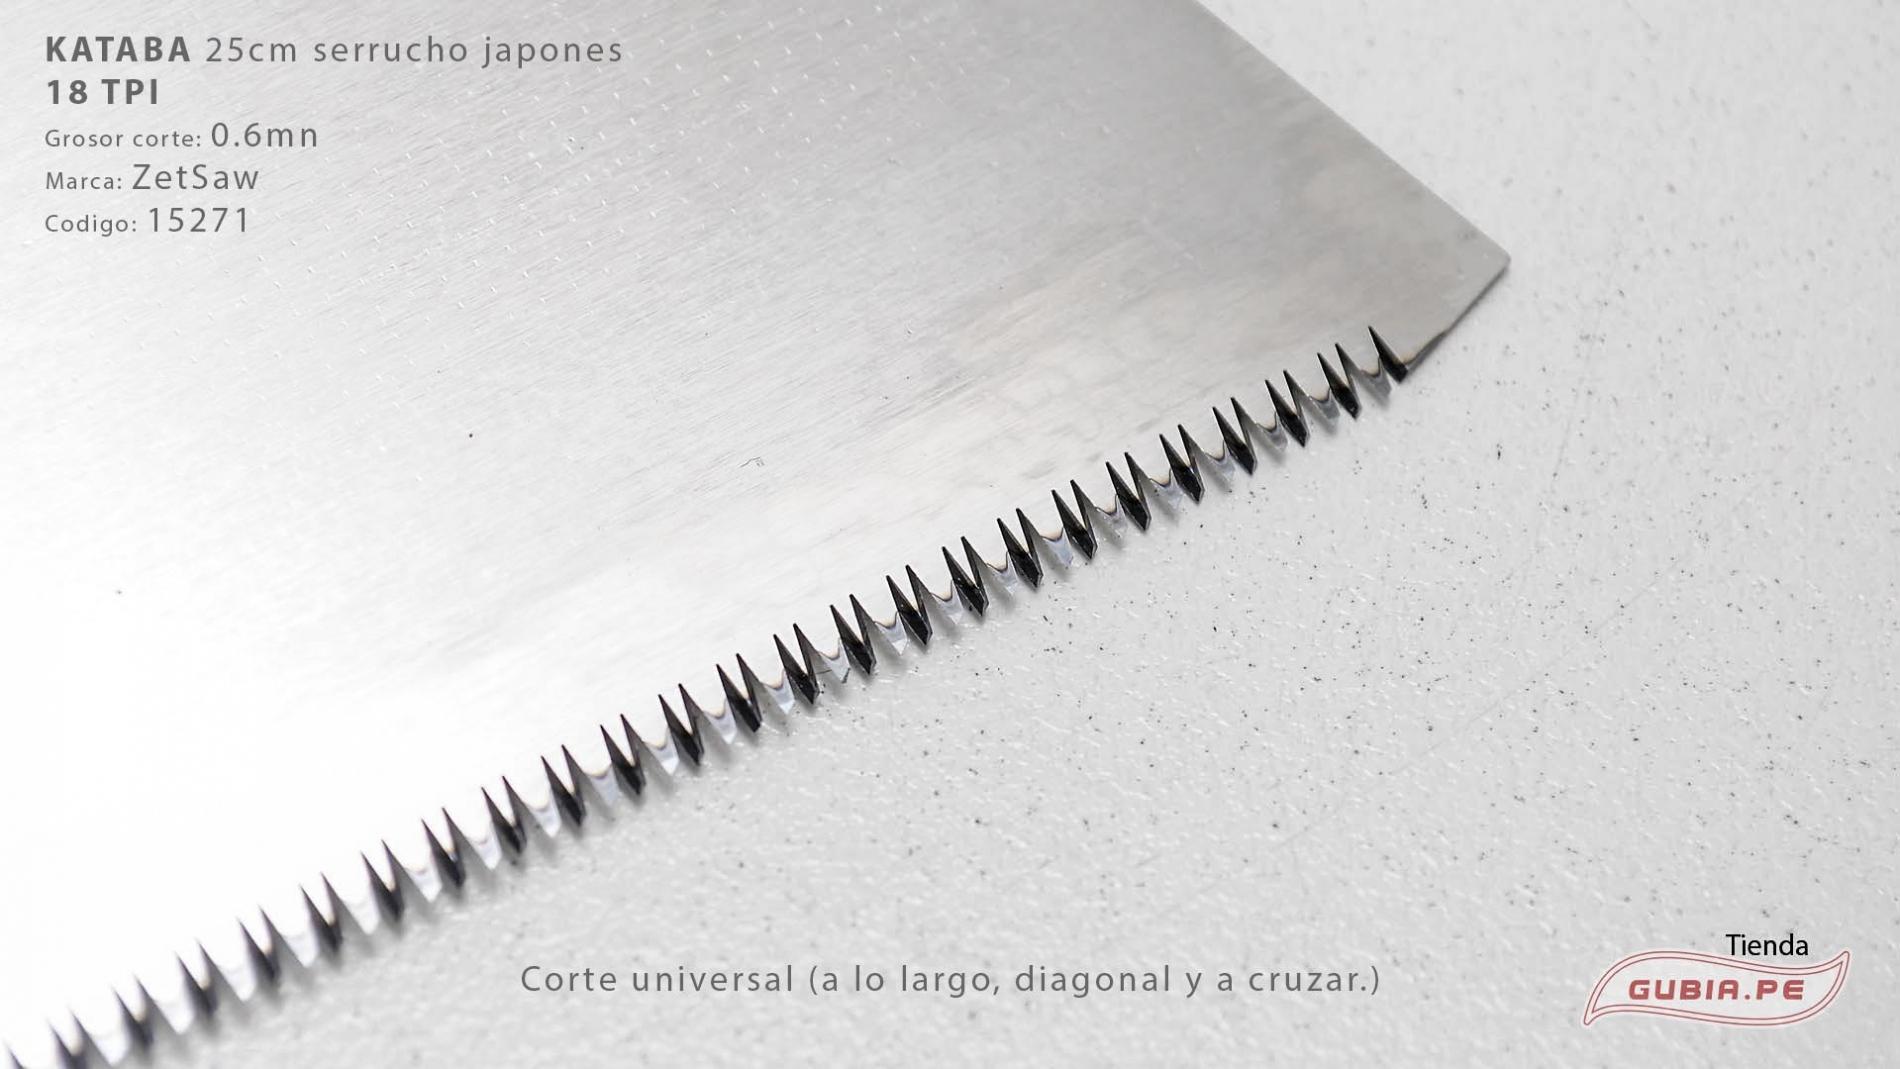 15271-Kataba 18TPI corte universal 25cm ZetSaw 15271-max-3.